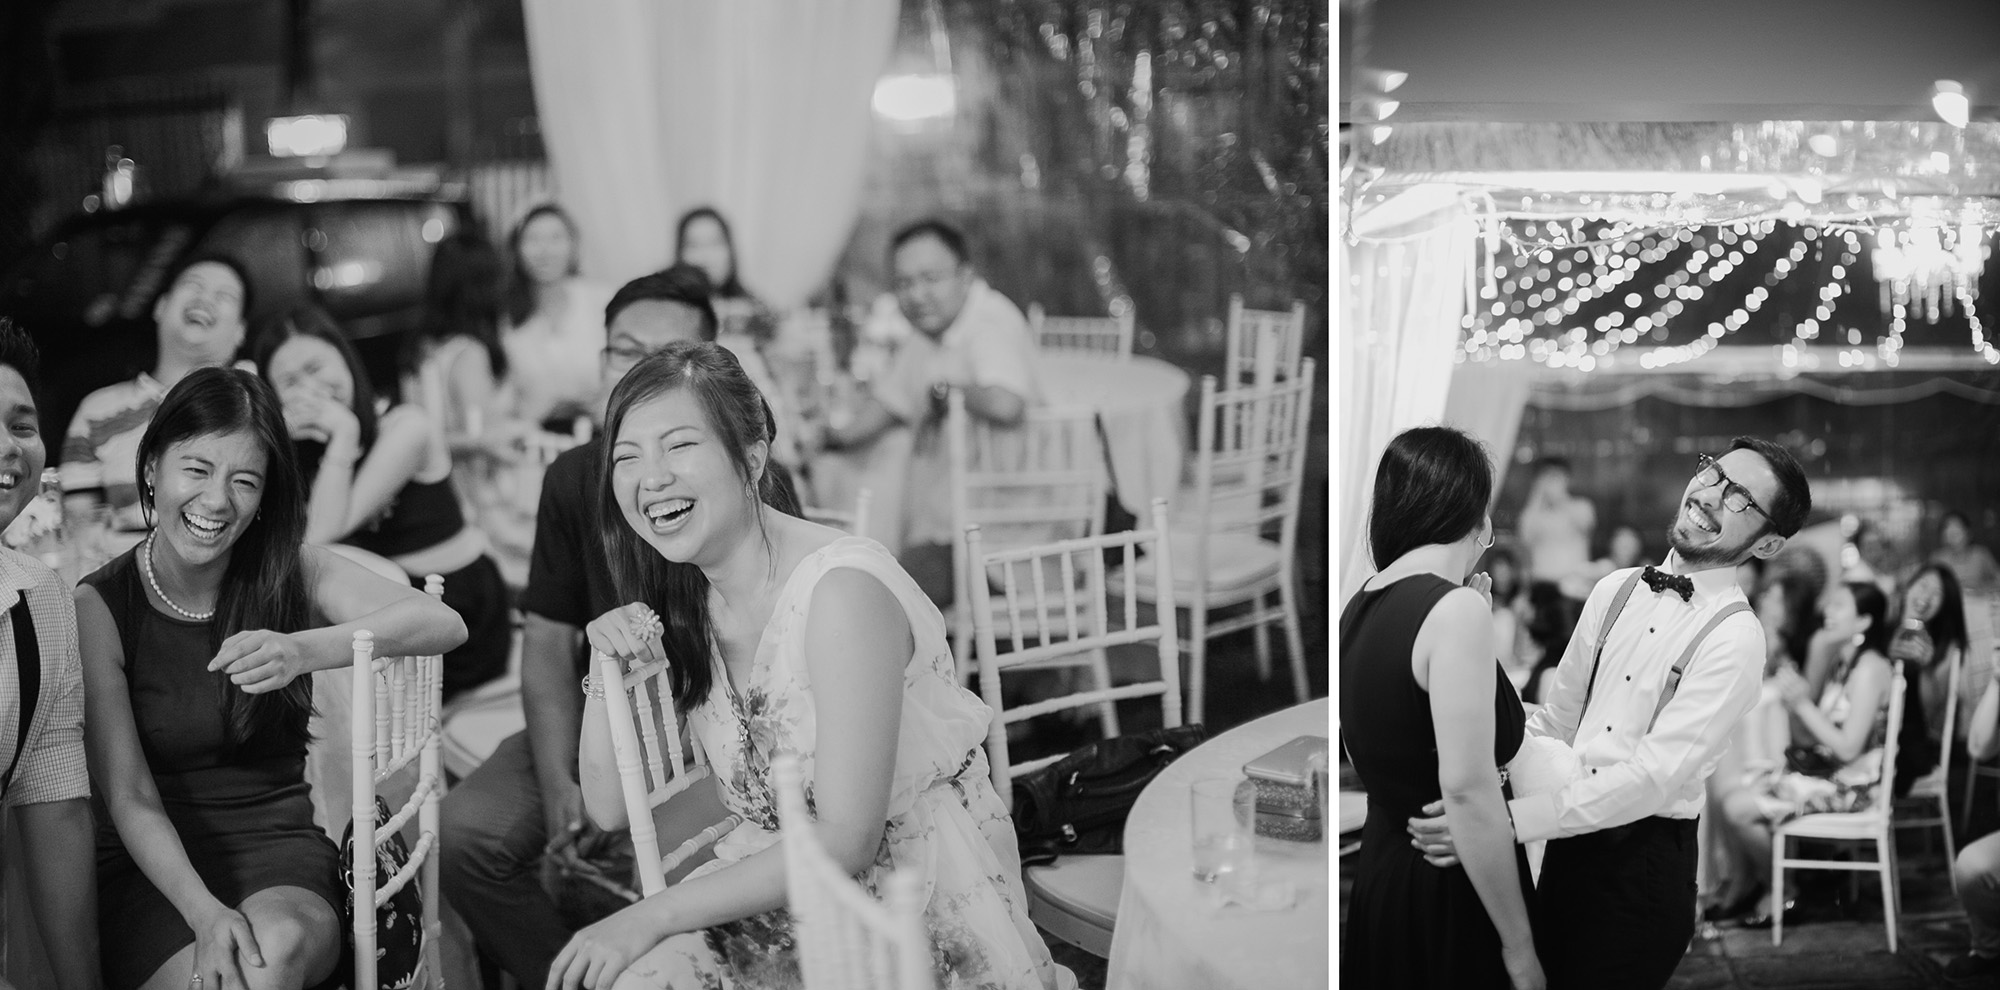 97-hellojanelee-sam grace-malaysia-wedding-day